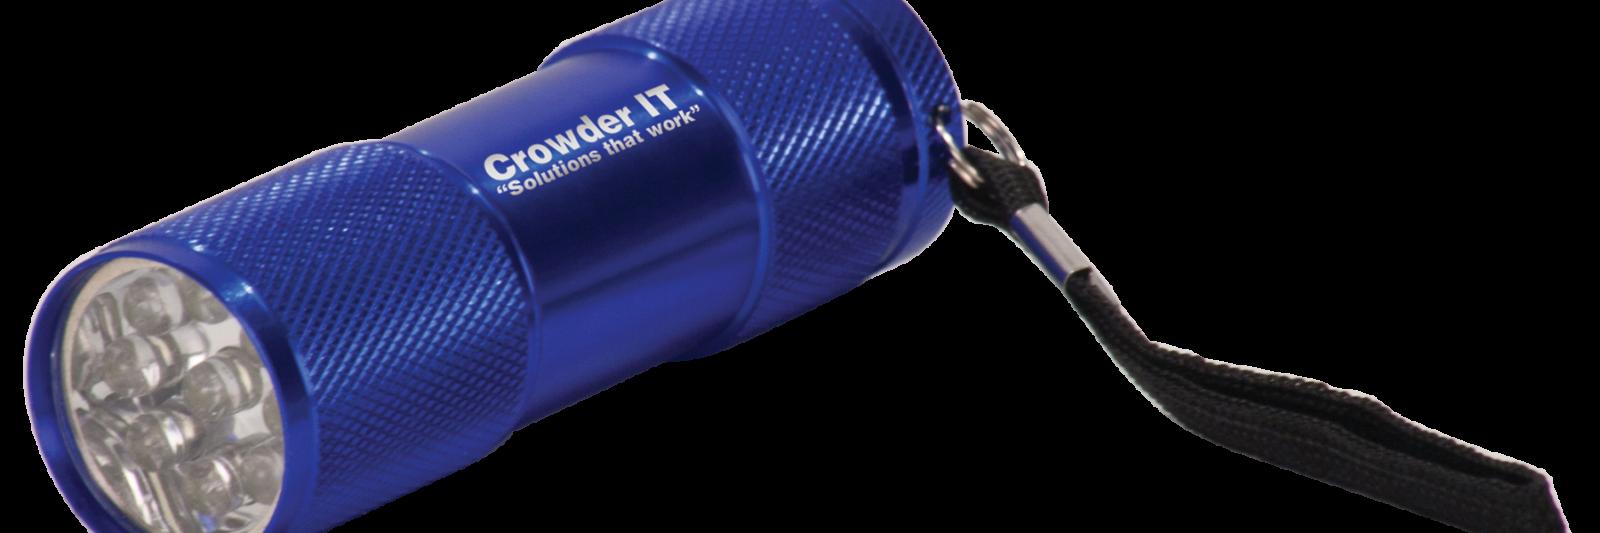 5-LED Flashlight (Copy)